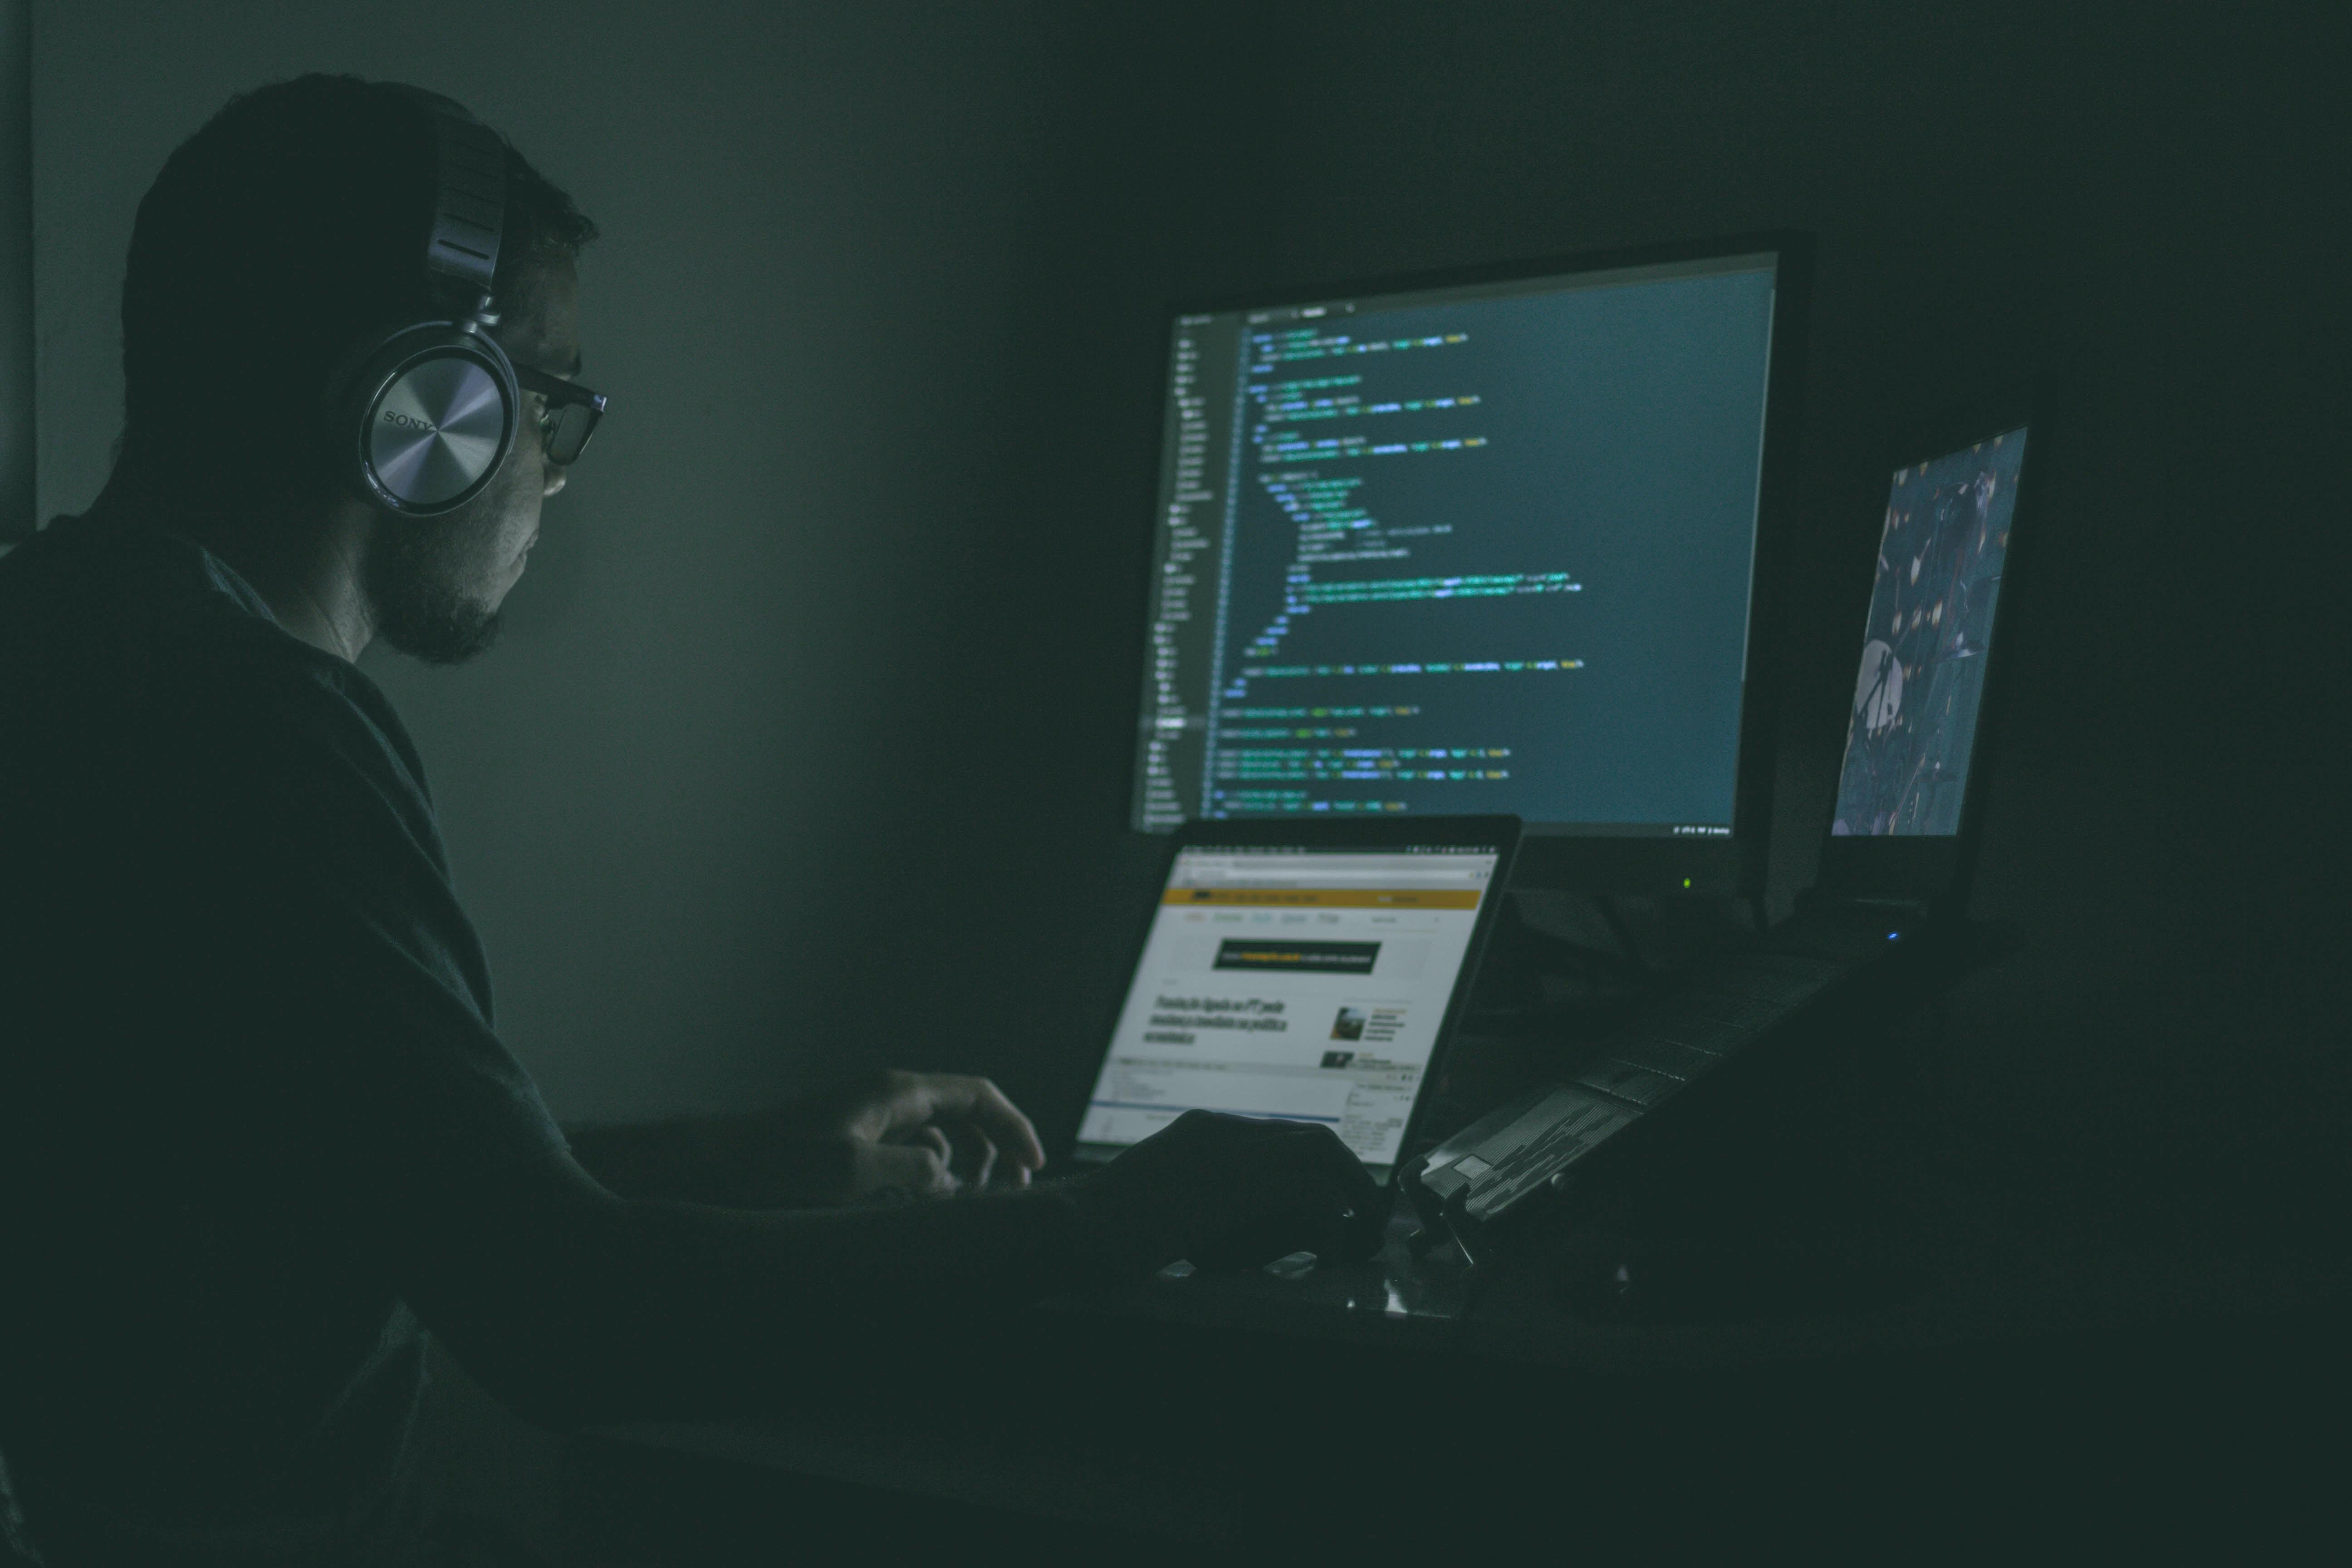 Using AI to Spot Fraud